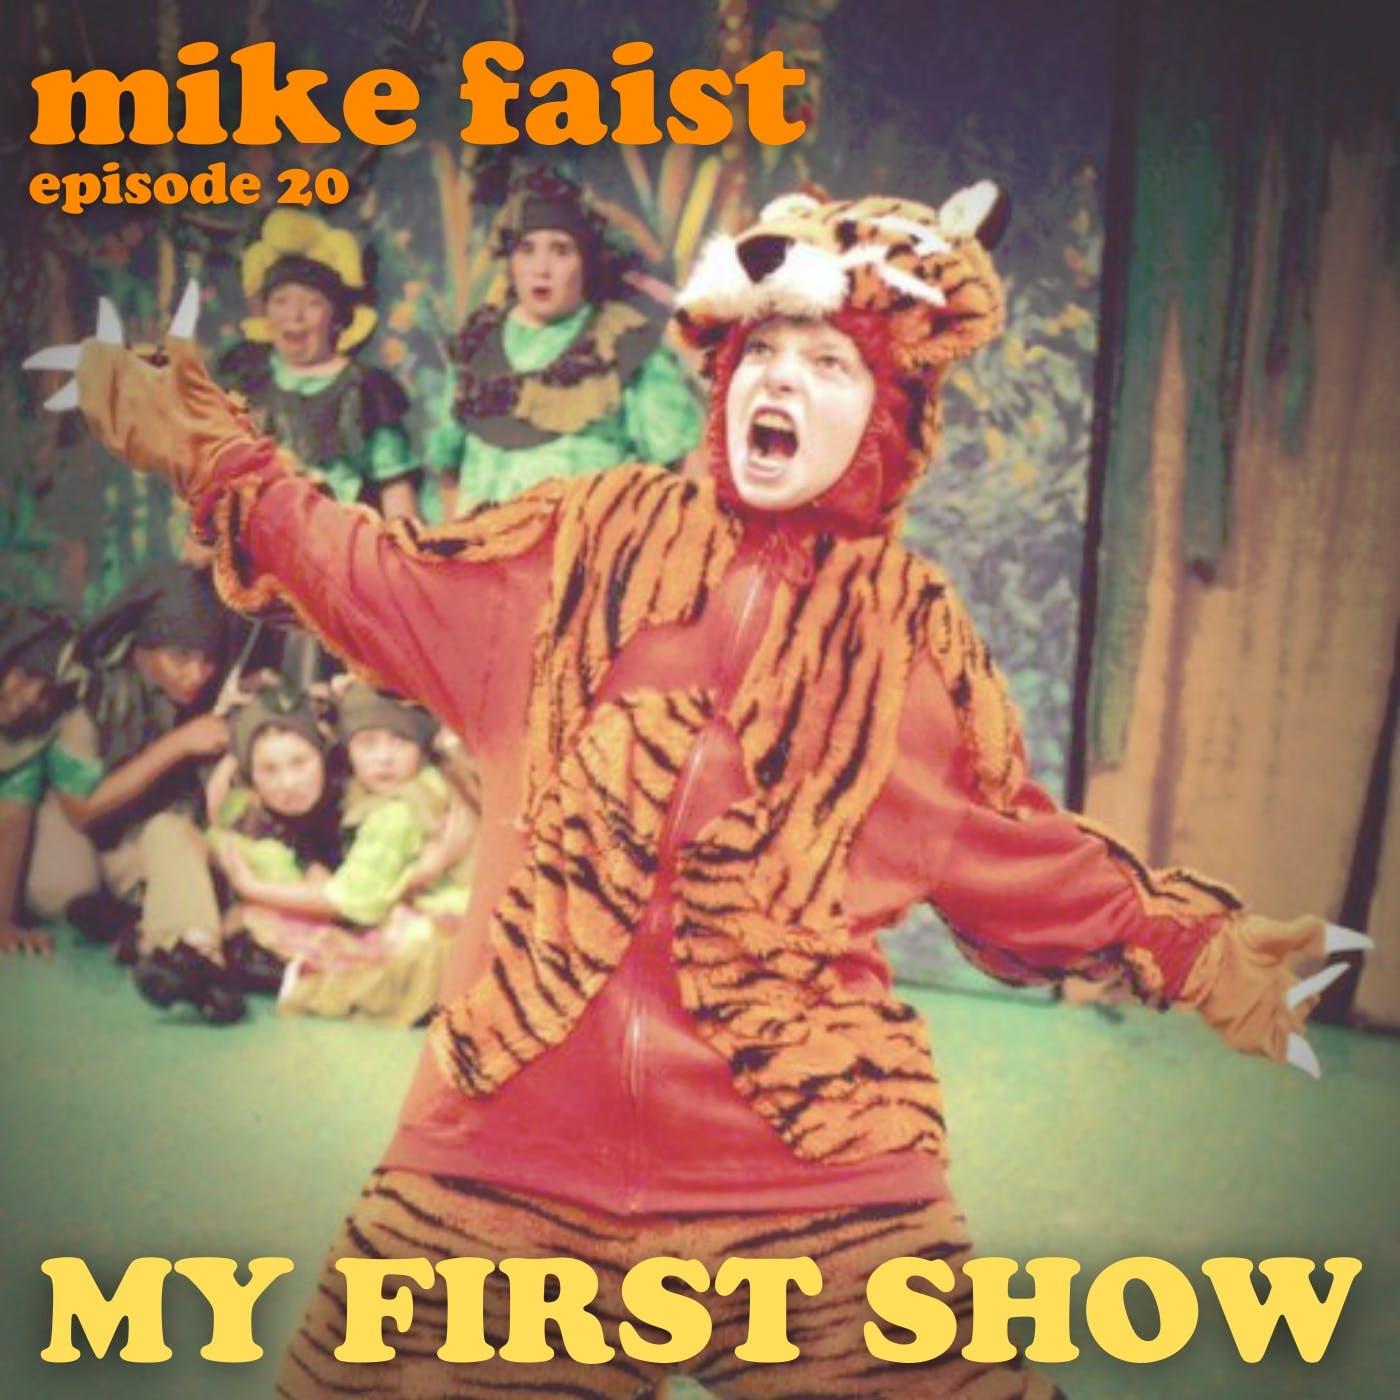 S1/Ep20: Mike Faist